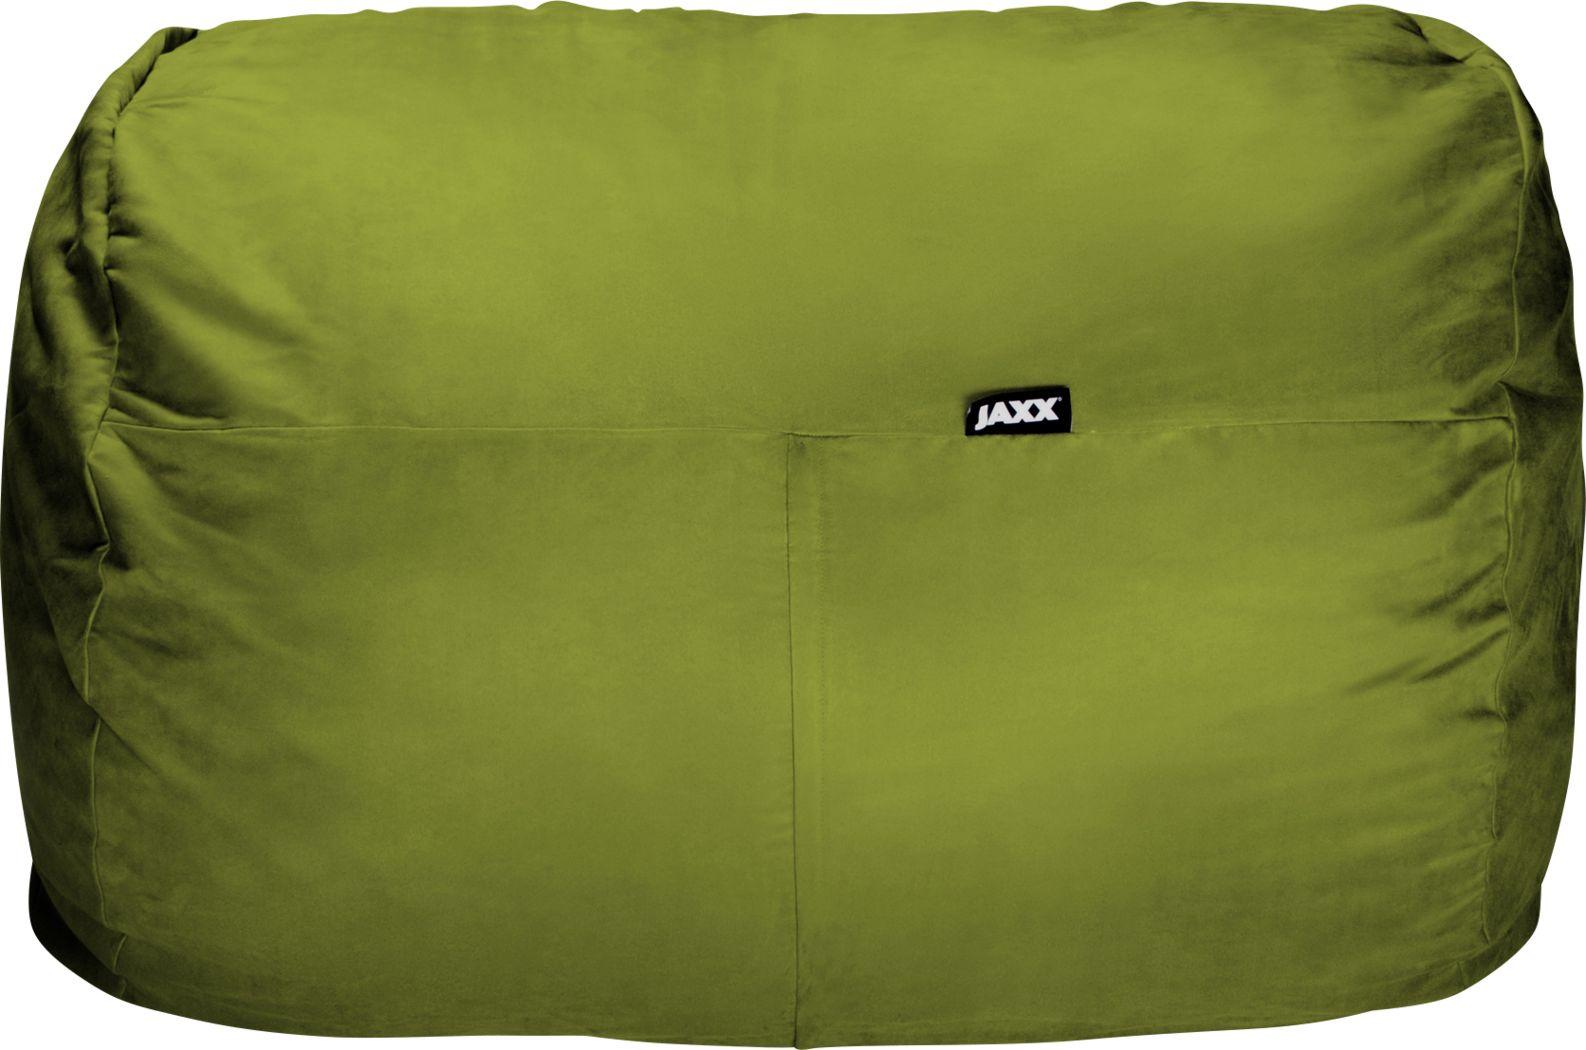 Kids Bexley Green Bean Bag Chair